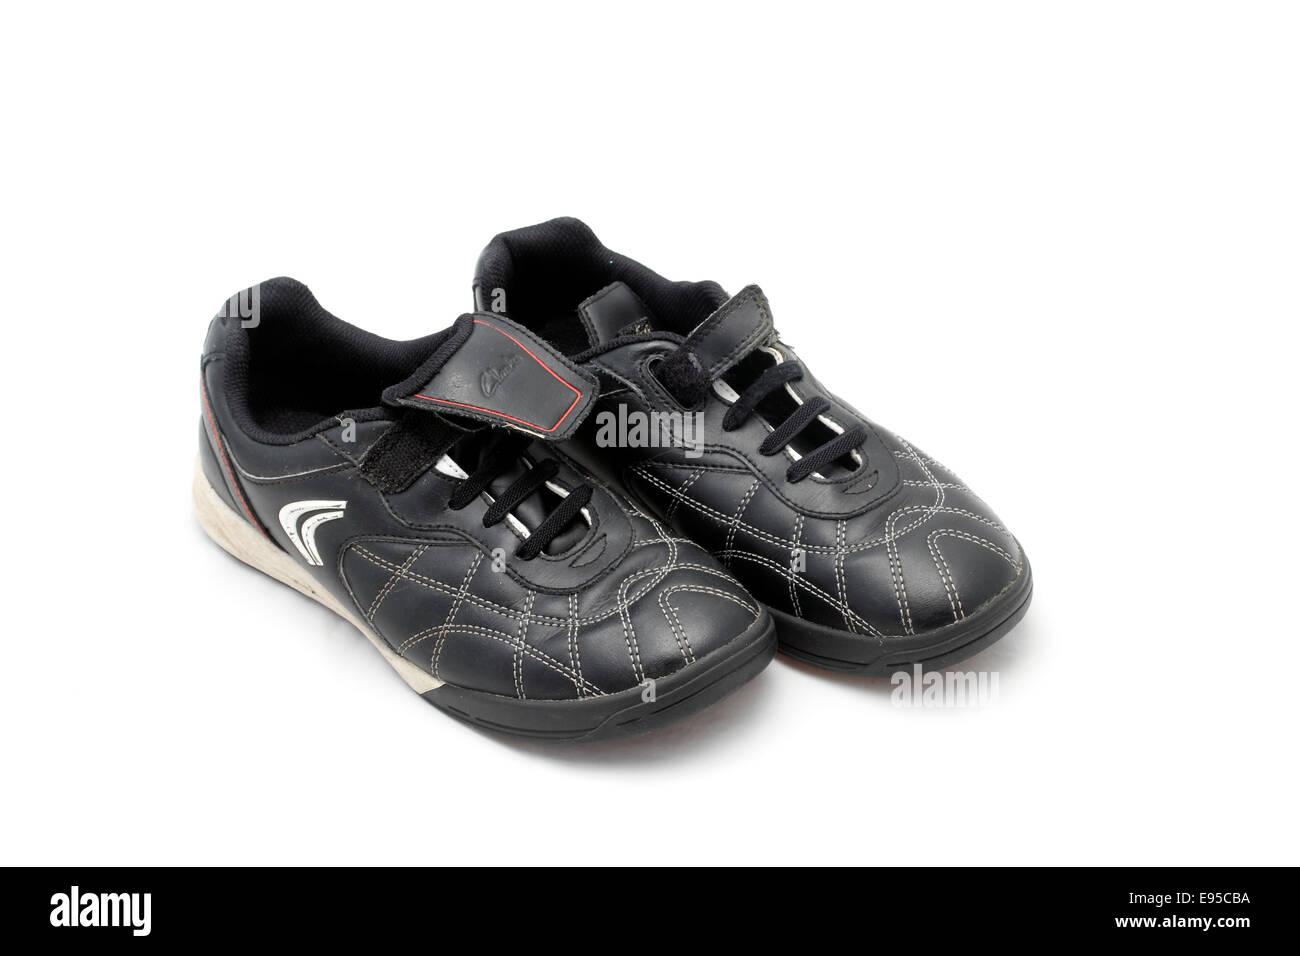 Clarks boys/girls non marking size 3 trainers black Velcro fasten - Stock Image